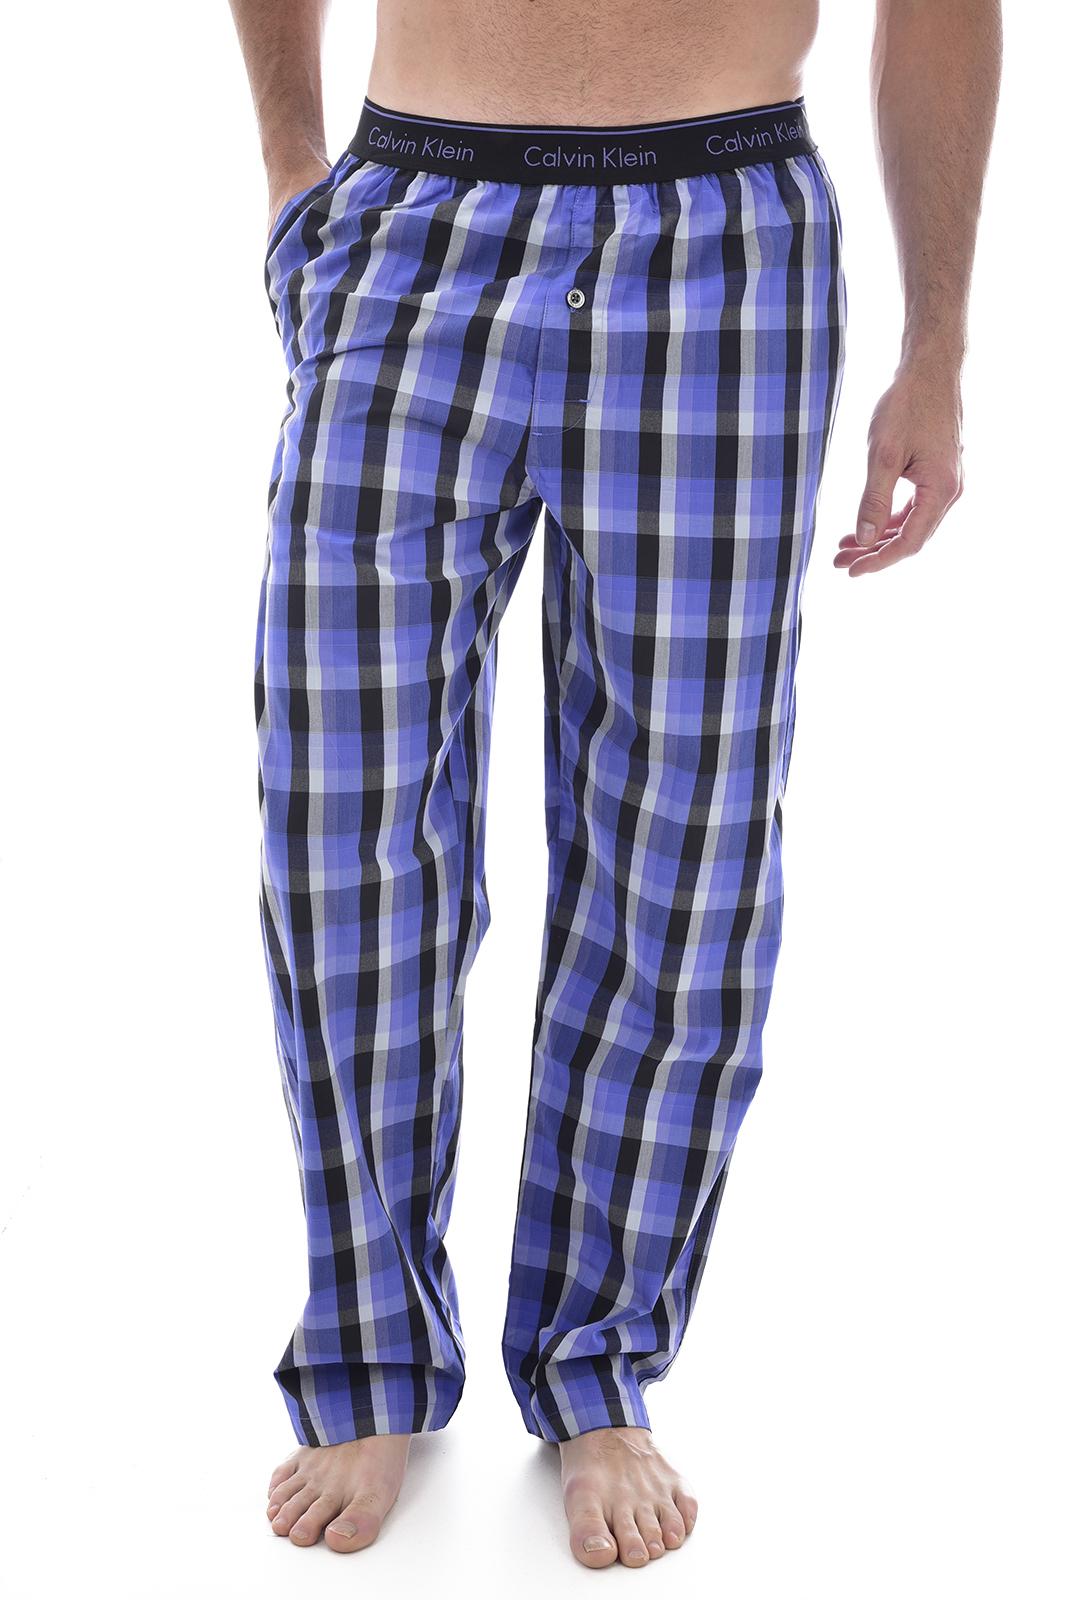 Pyjamas-Peignoirs  Calvin klein 0000U1723A 7BK